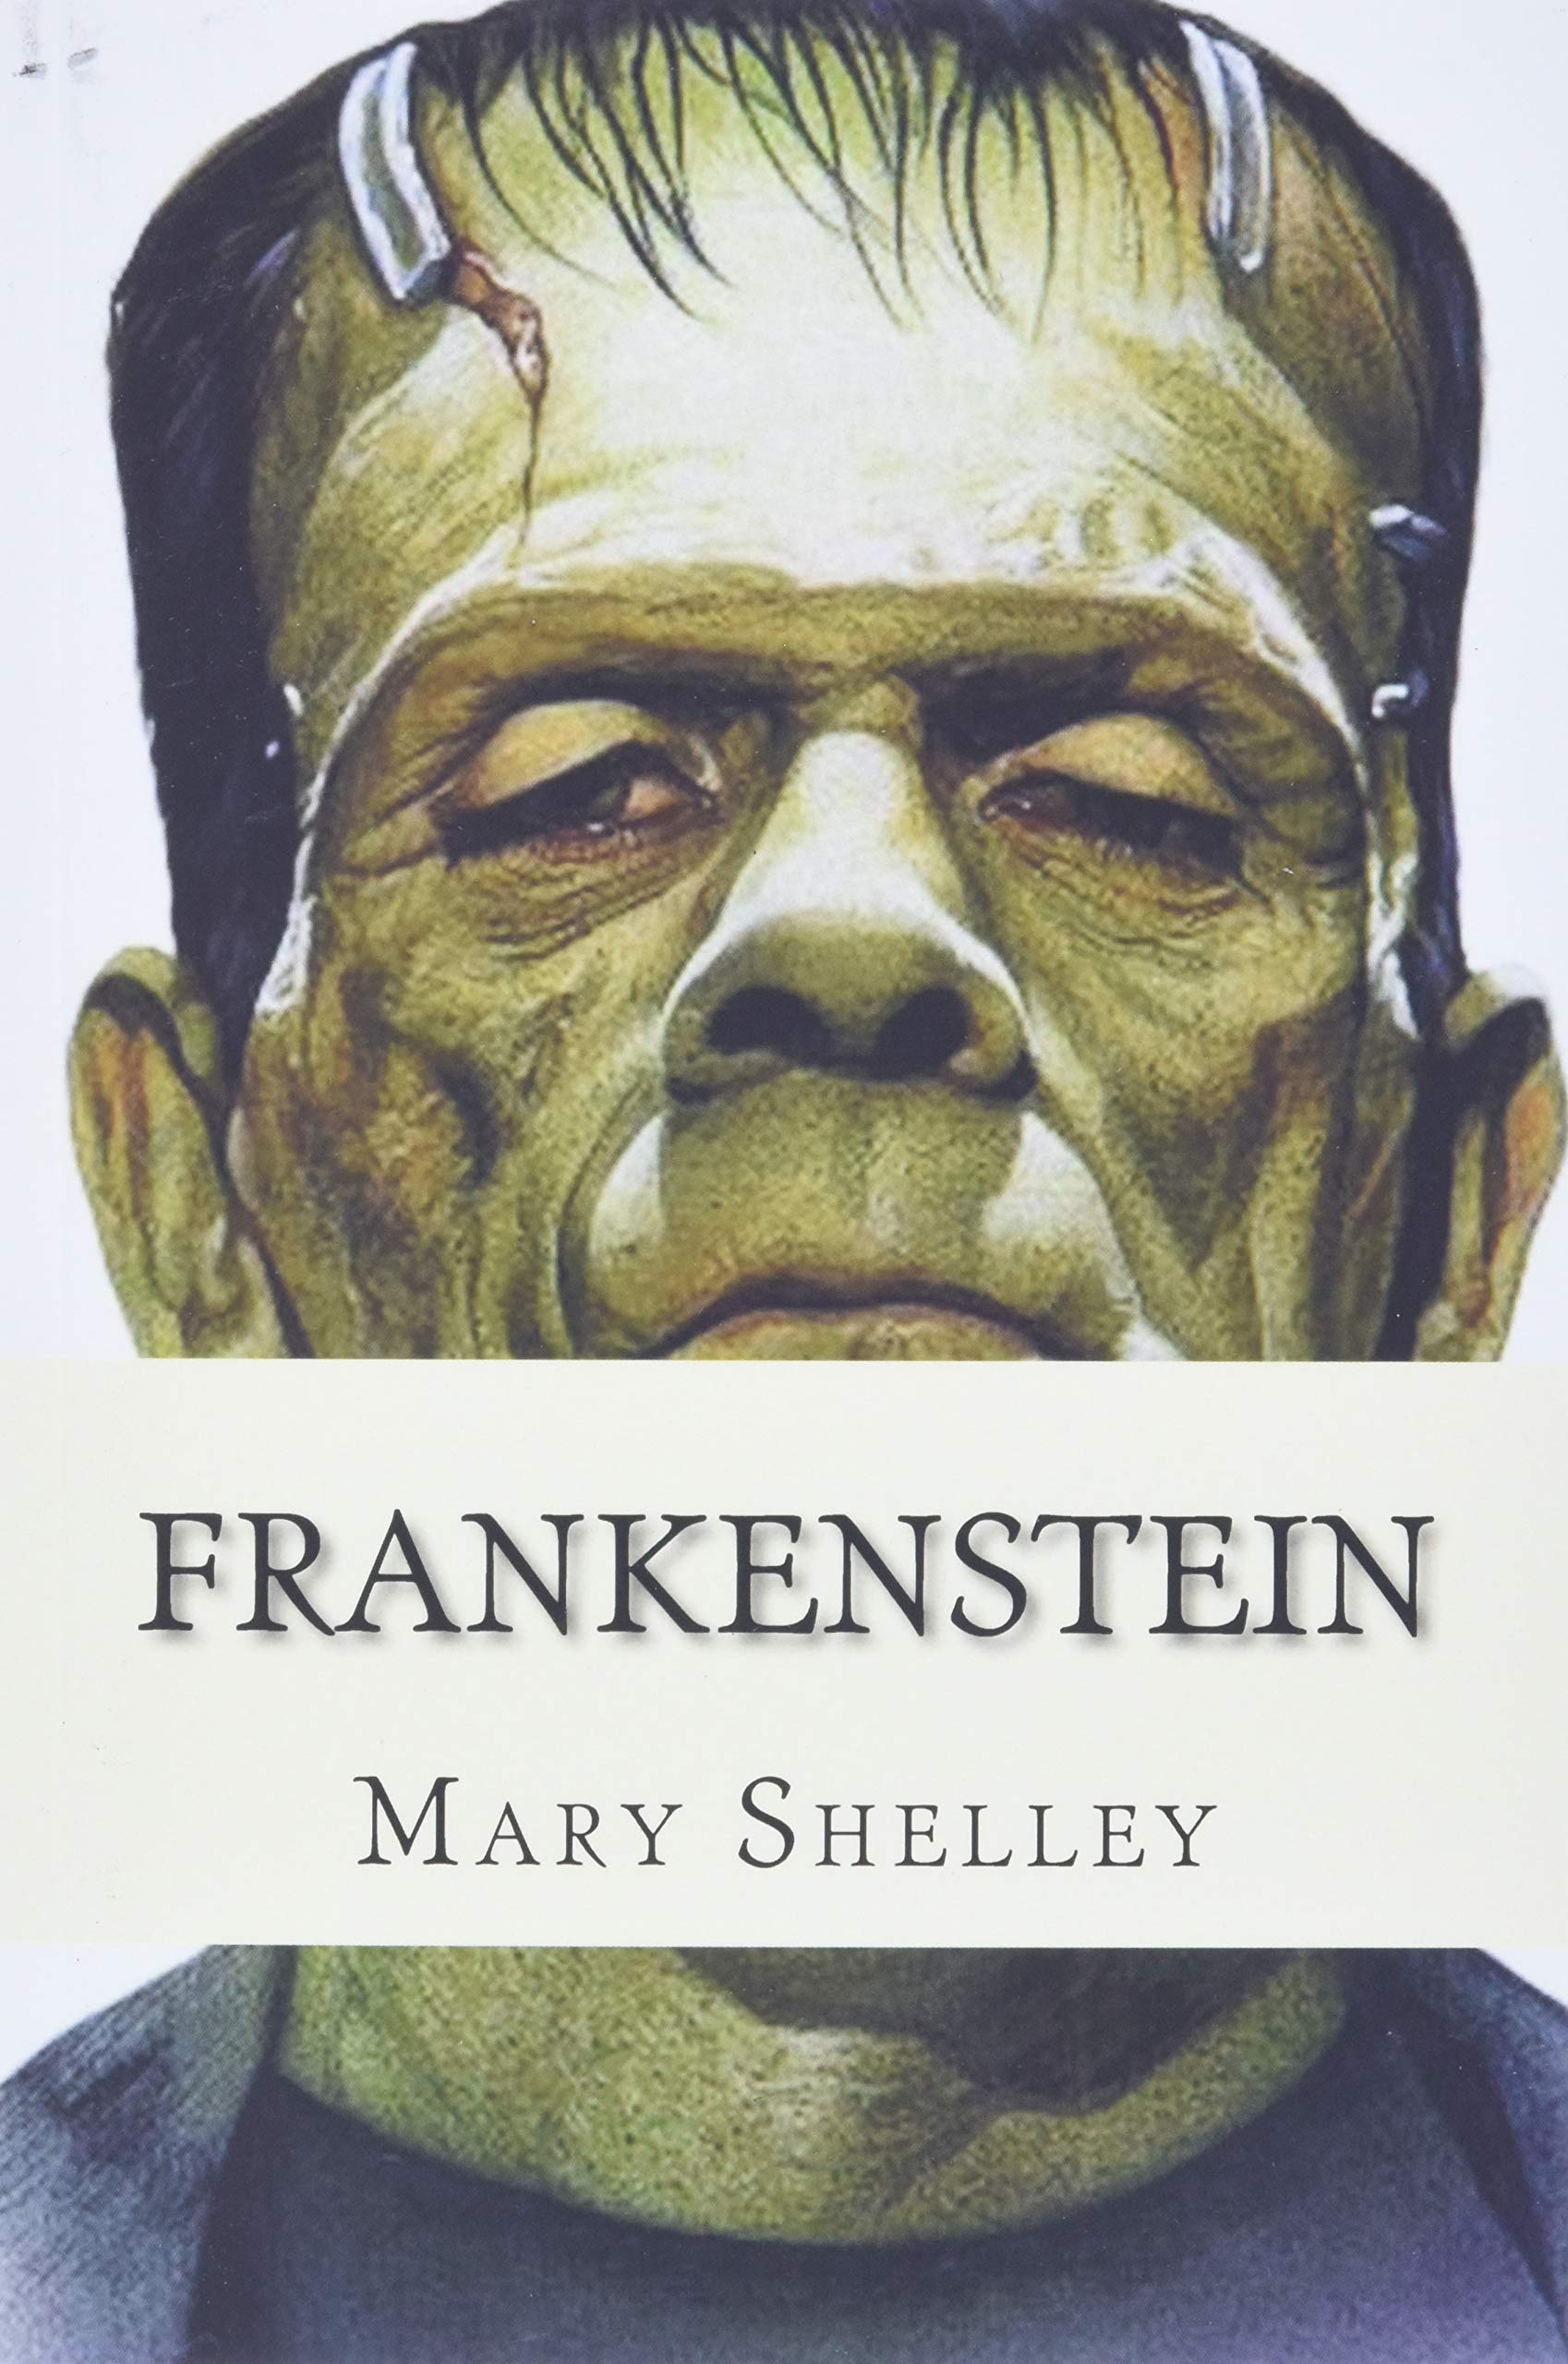 Frankenstein: Shelley, Mary: 9781512308051: Amazon.com: Books